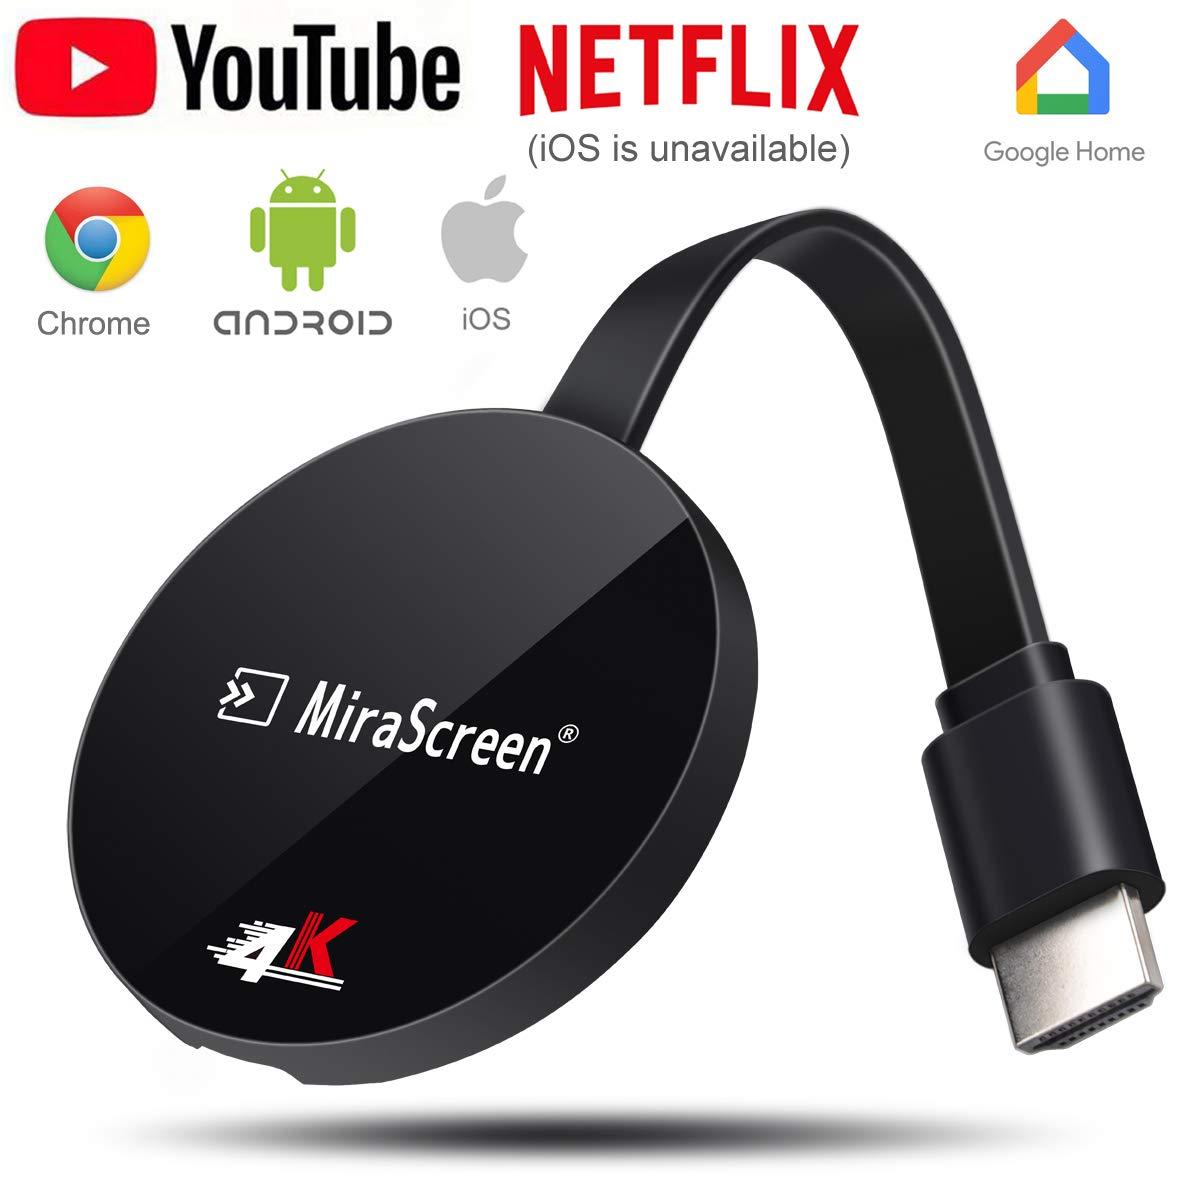 Adaptador HDMI inalámbrico 4K con pantalla WiFi Dongle para TV 4K y 1080P, adaptador de receptor